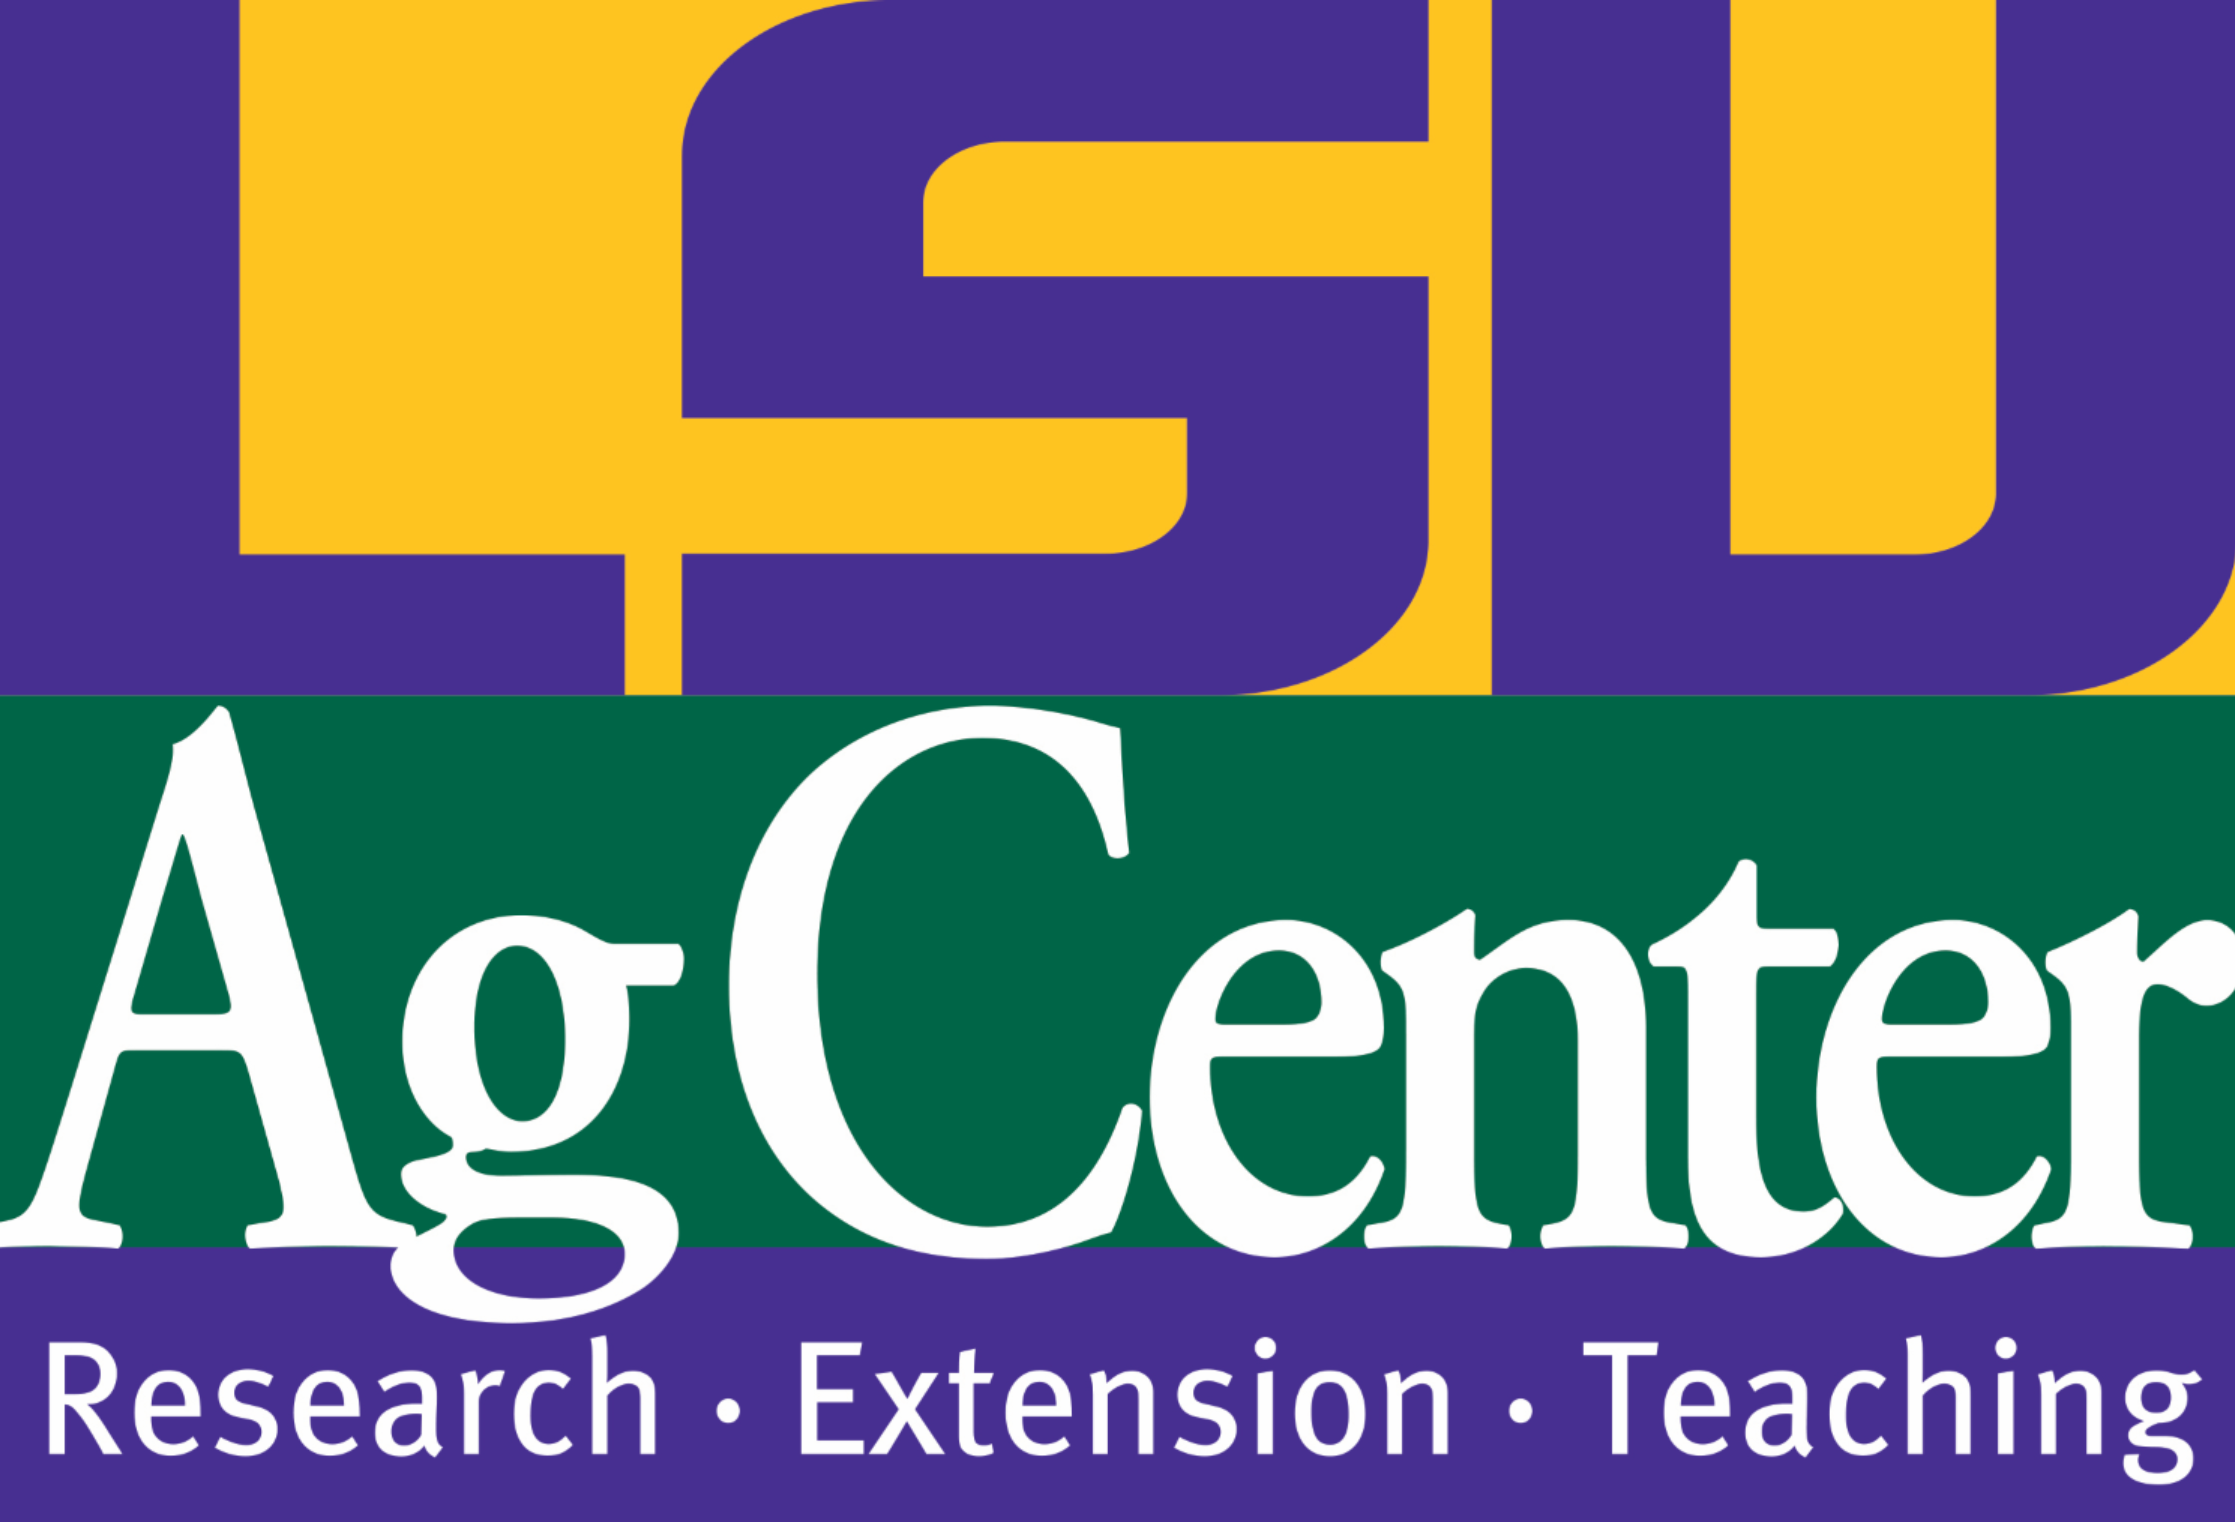 2019-07-09, LSU AgCenter.png